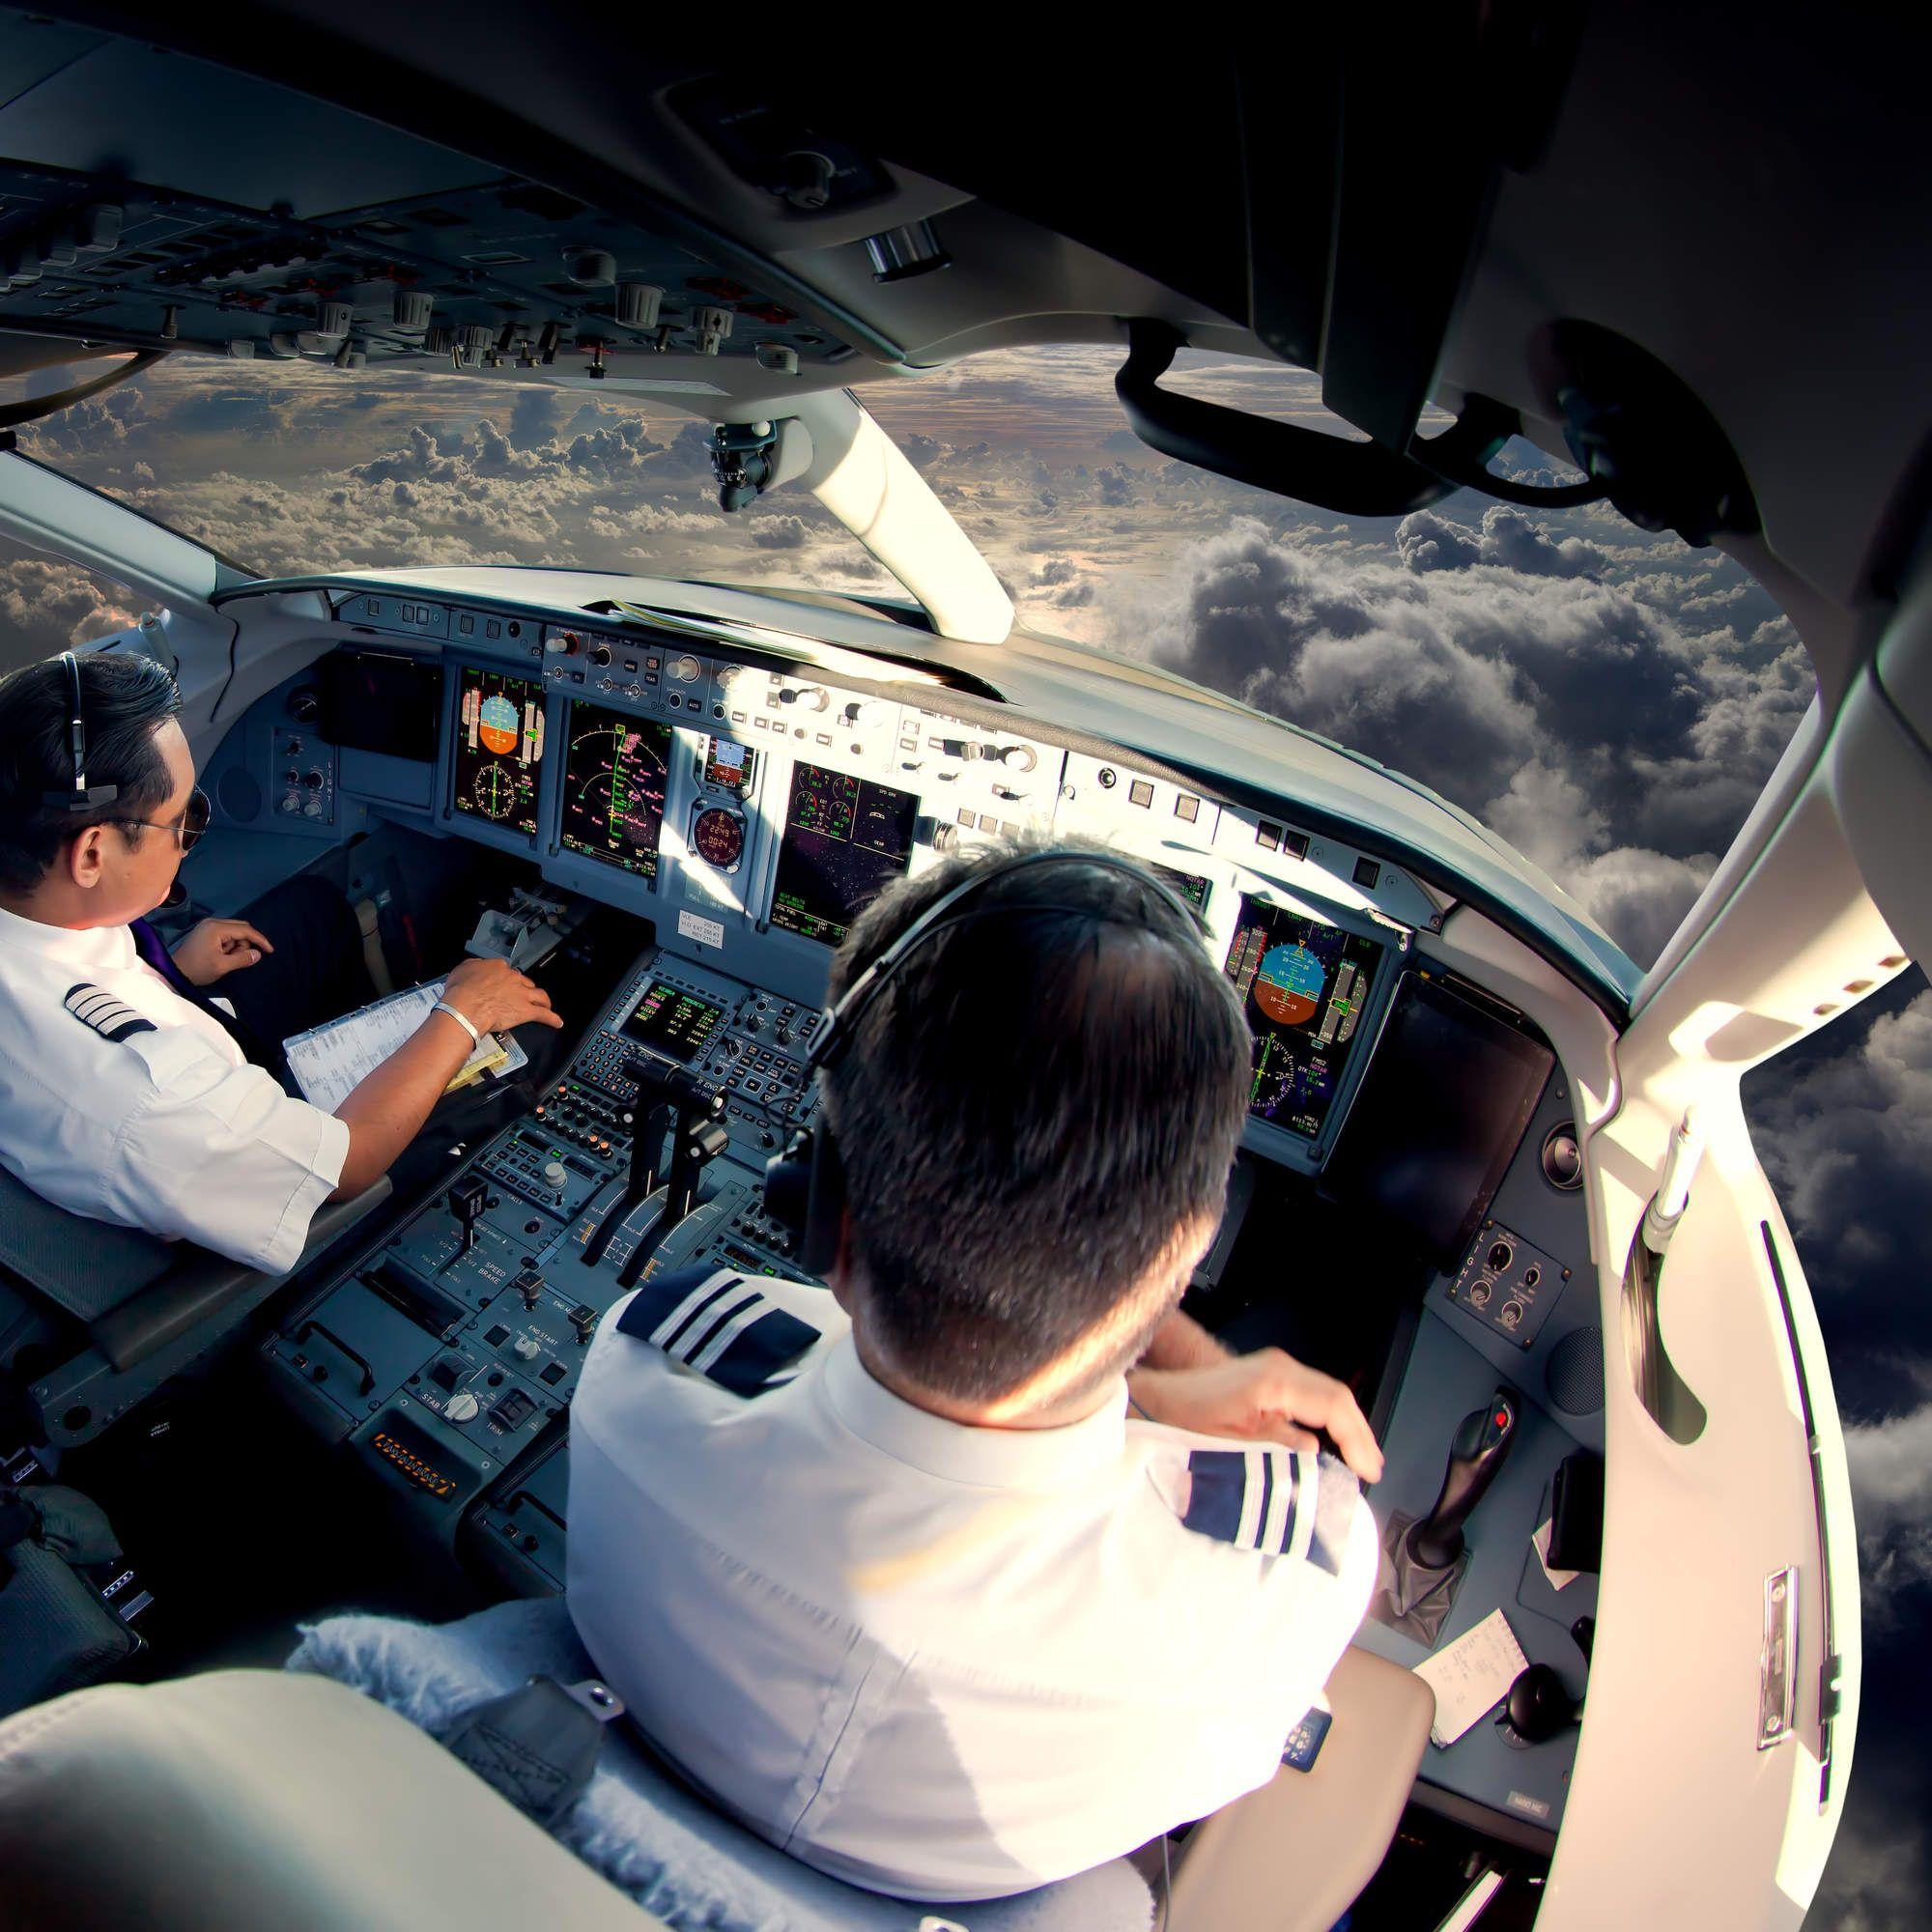 Pilots Reveal Terrifying Close Calls Passengers Didn't ...